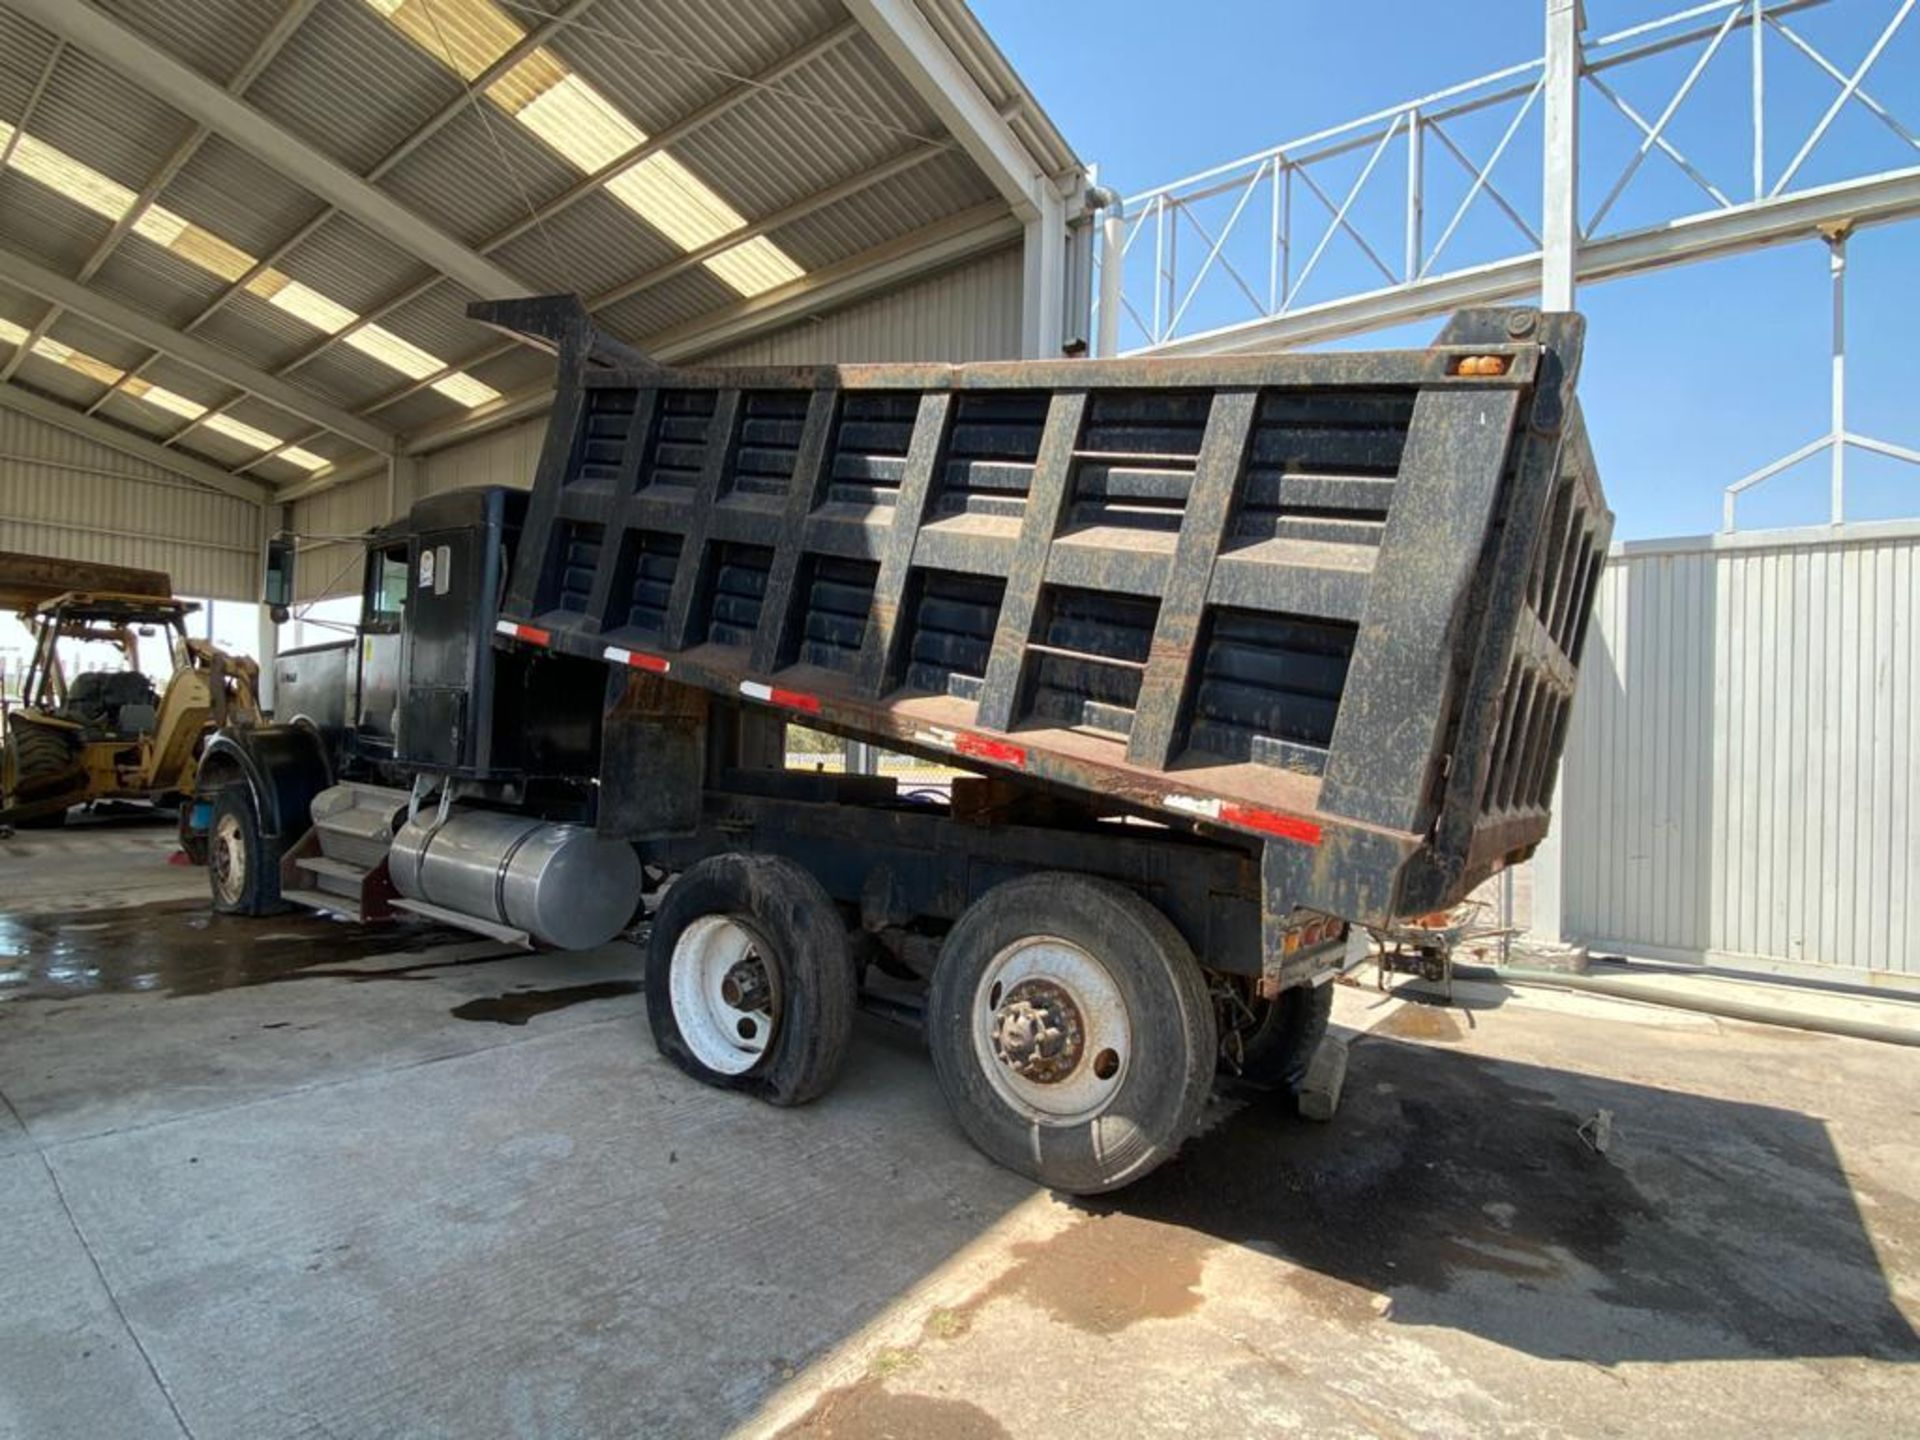 1983 Kenworth Dump Truck, standard transmission of 10 speeds, with Cummins motor - Image 18 of 68